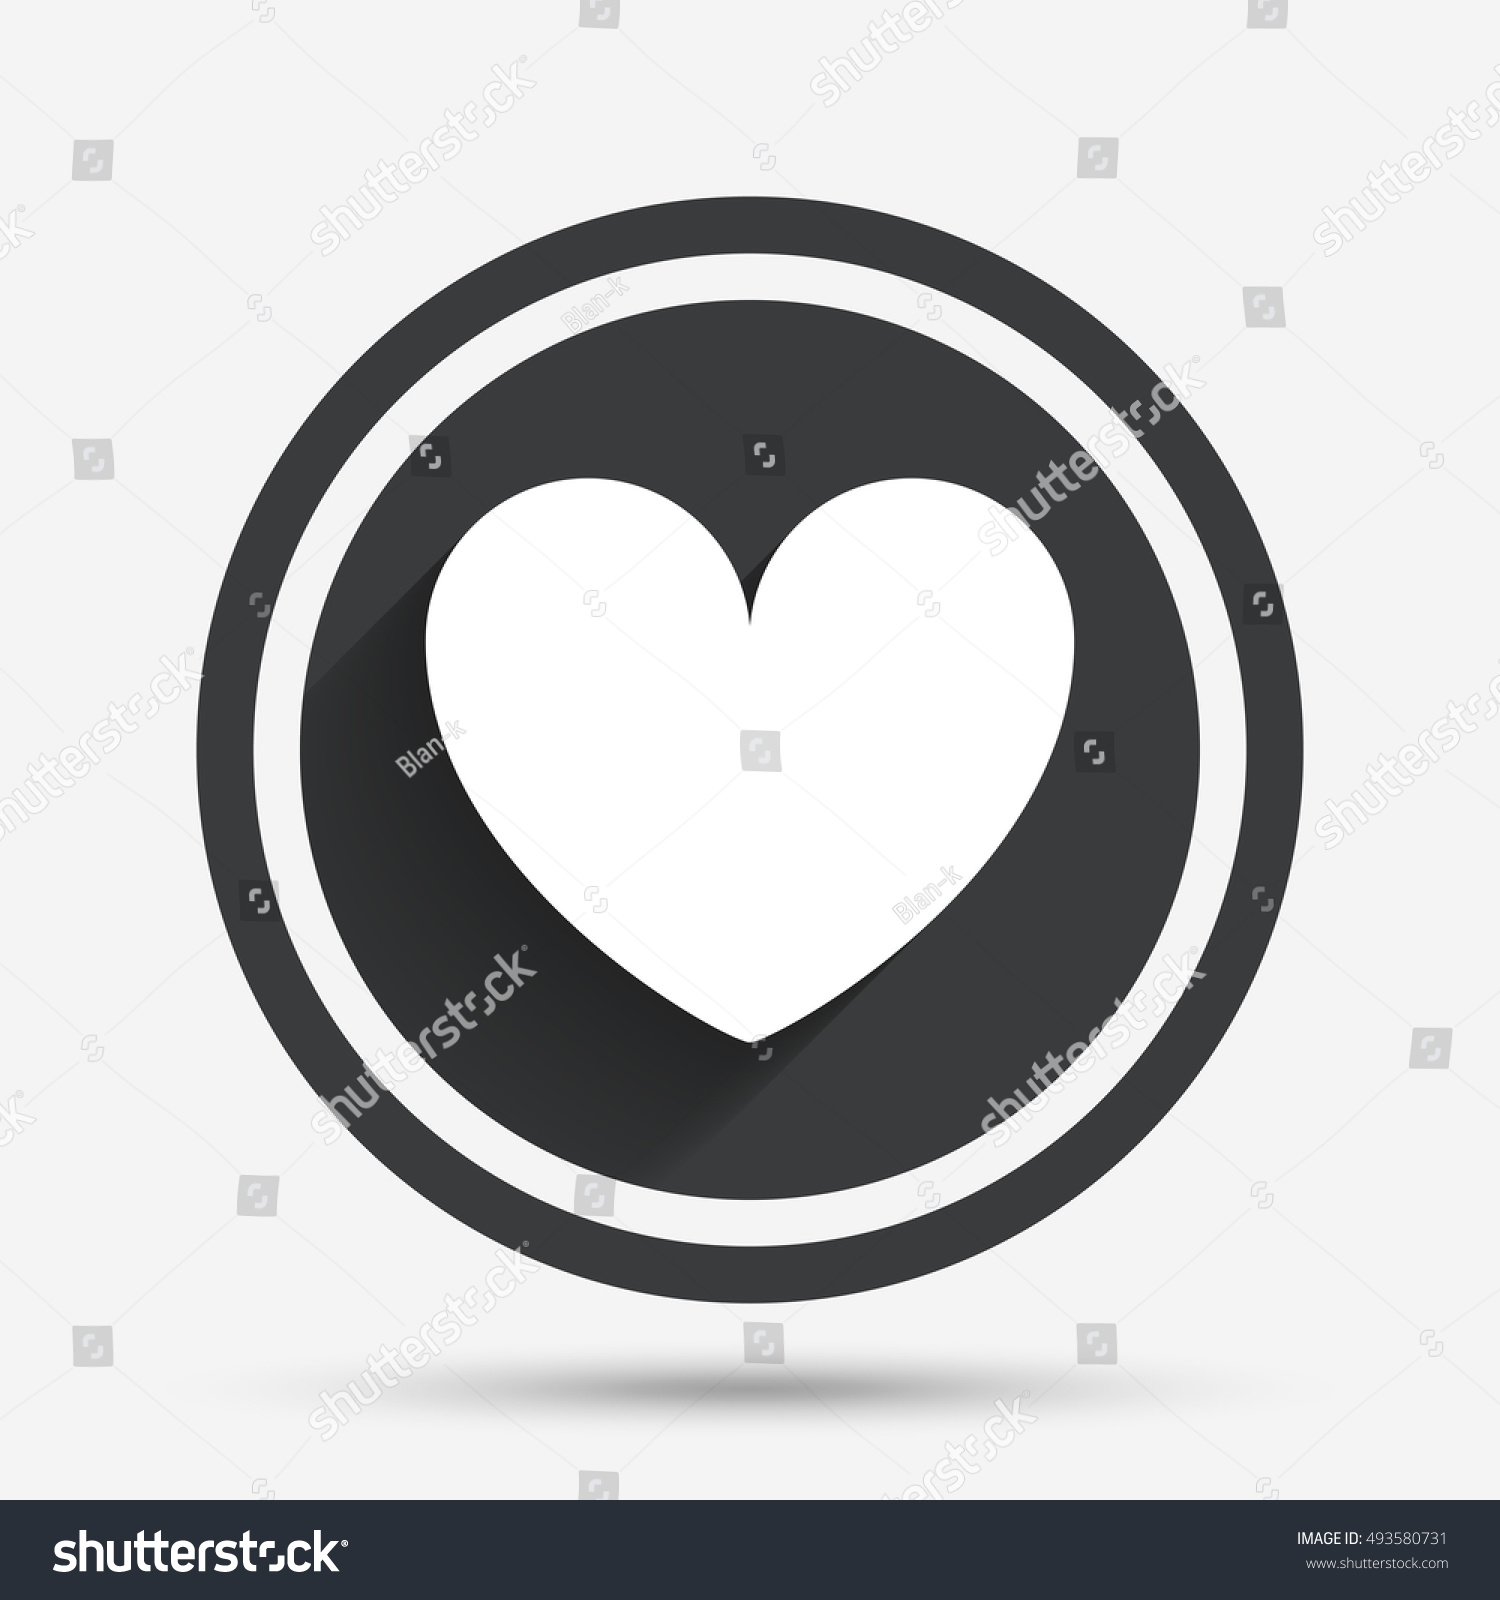 Heart sign icon love symbol circle stock vector 493580731 heart sign icon love symbol circle stock vector 493580731 shutterstock buycottarizona